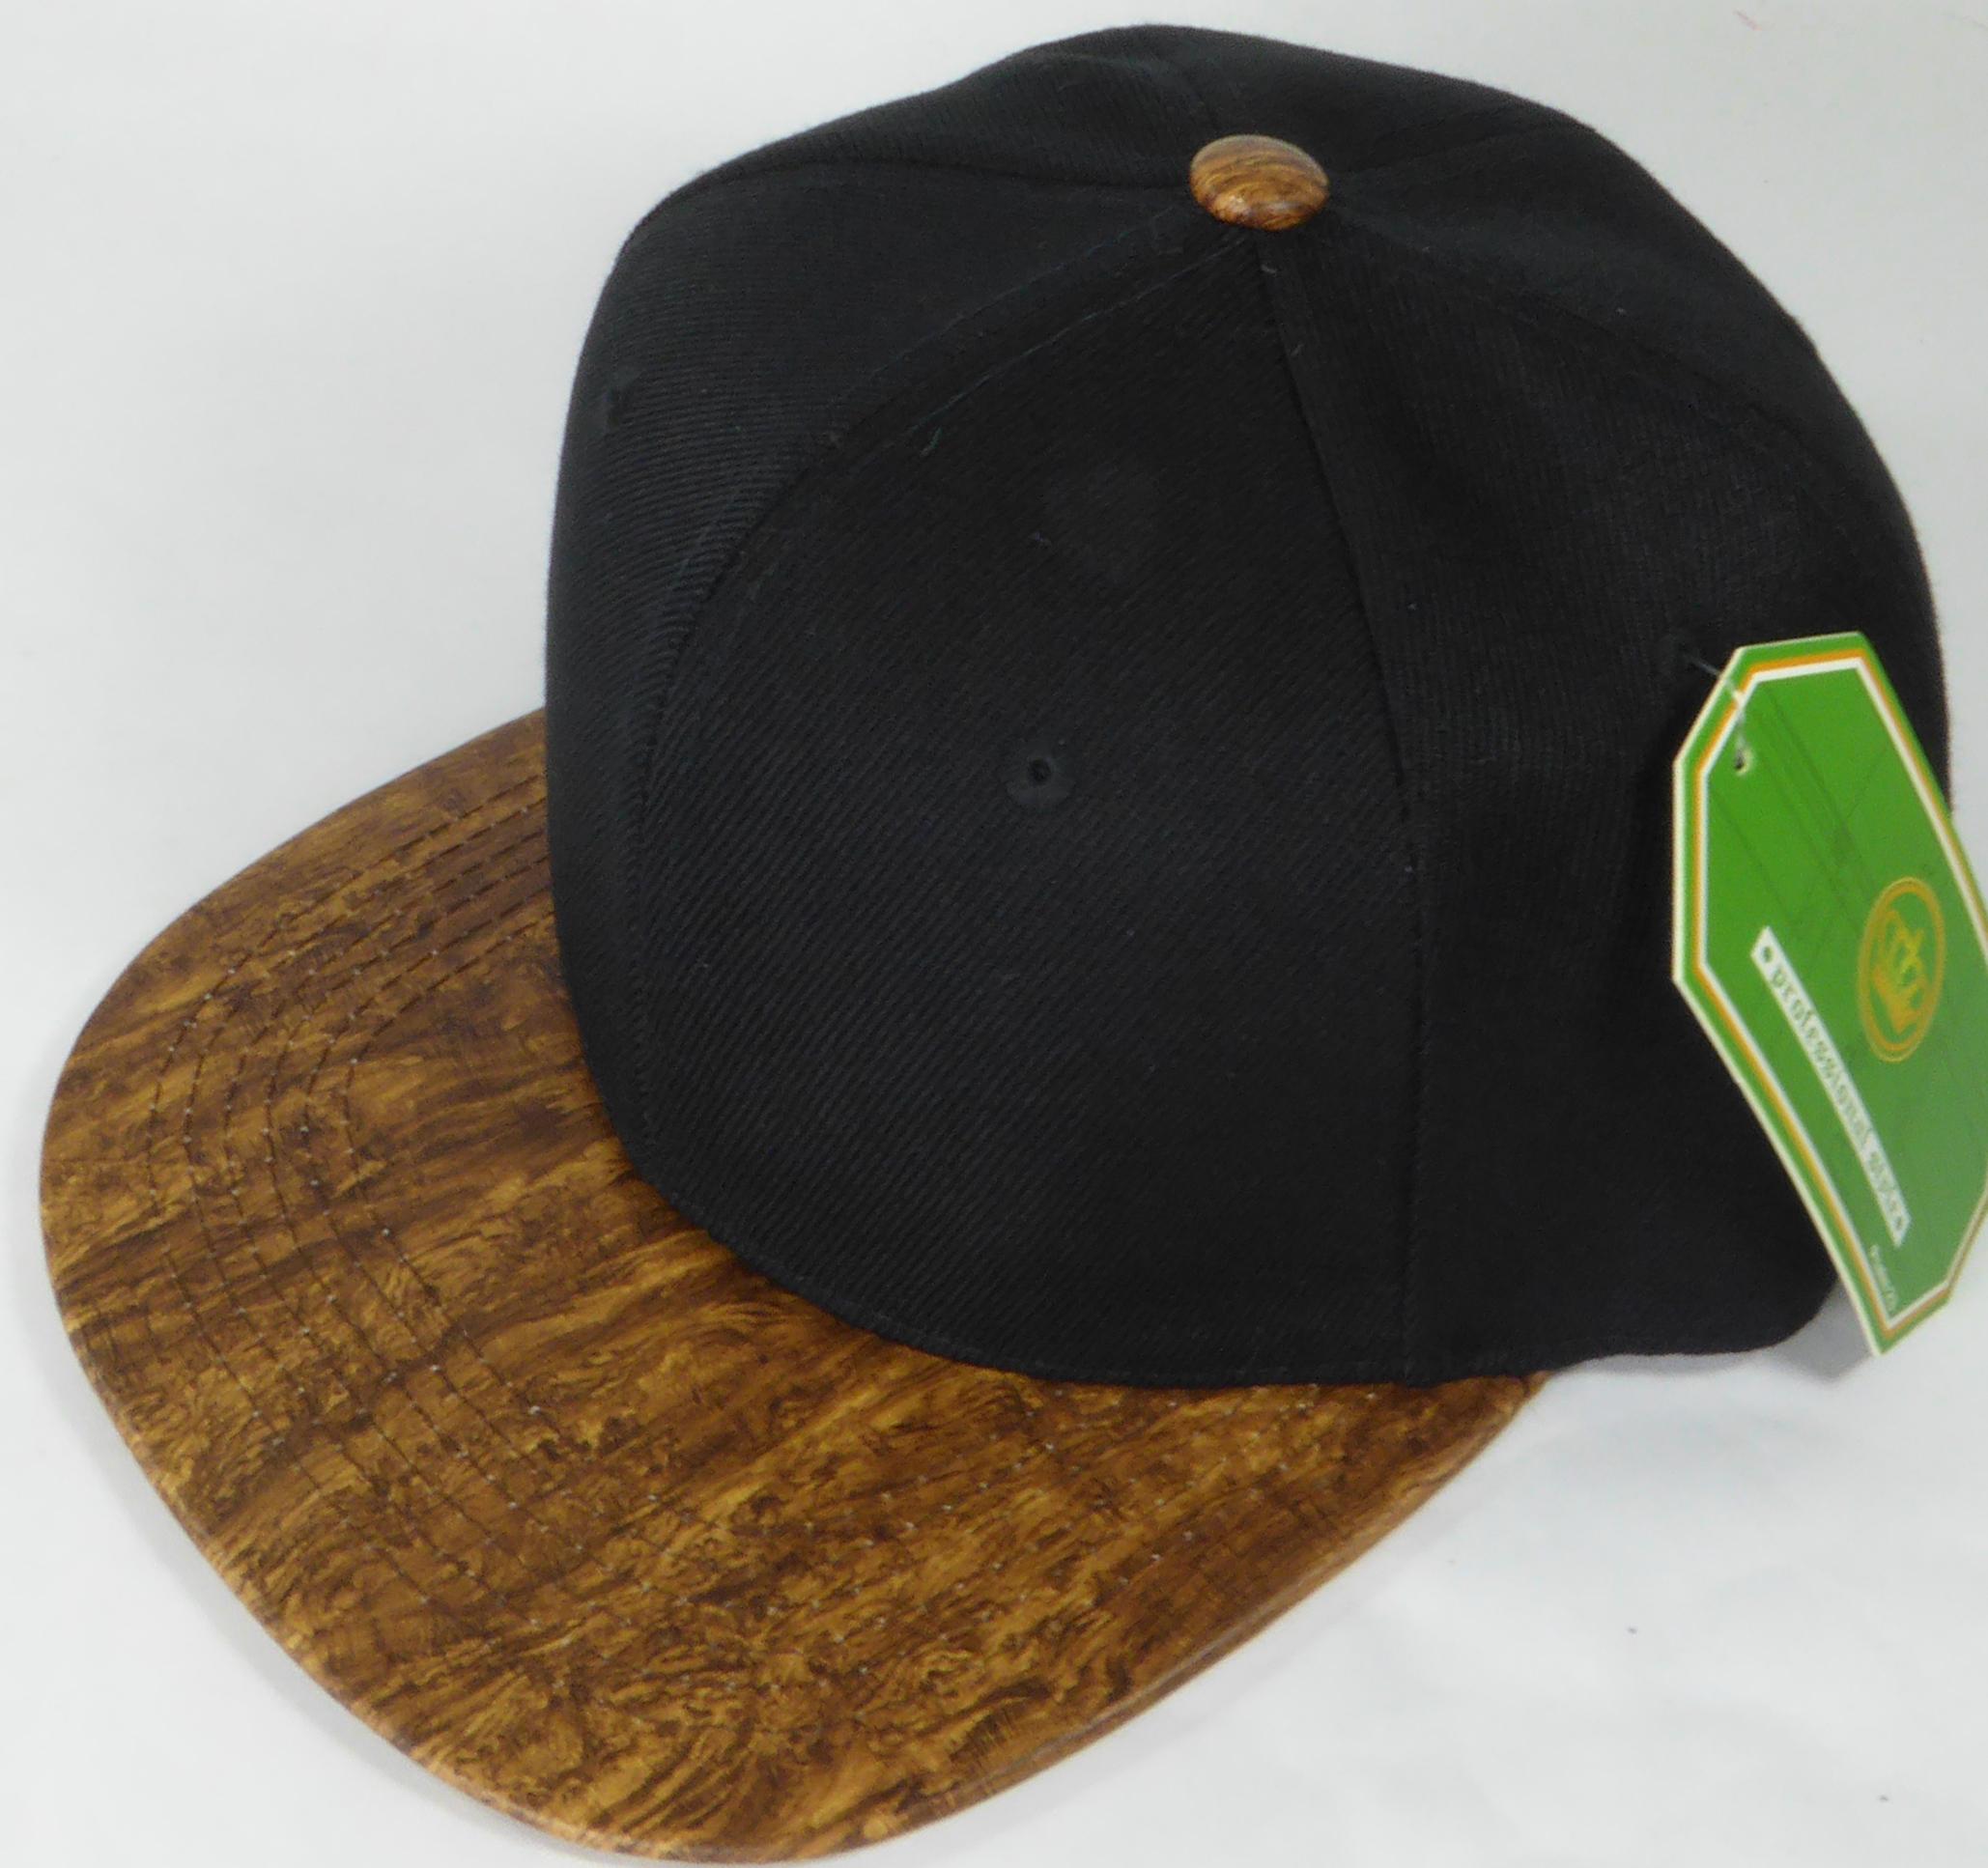 7d40e85dab34e Wholesale Blank Snapback Caps - Brown Oak Woodbrim